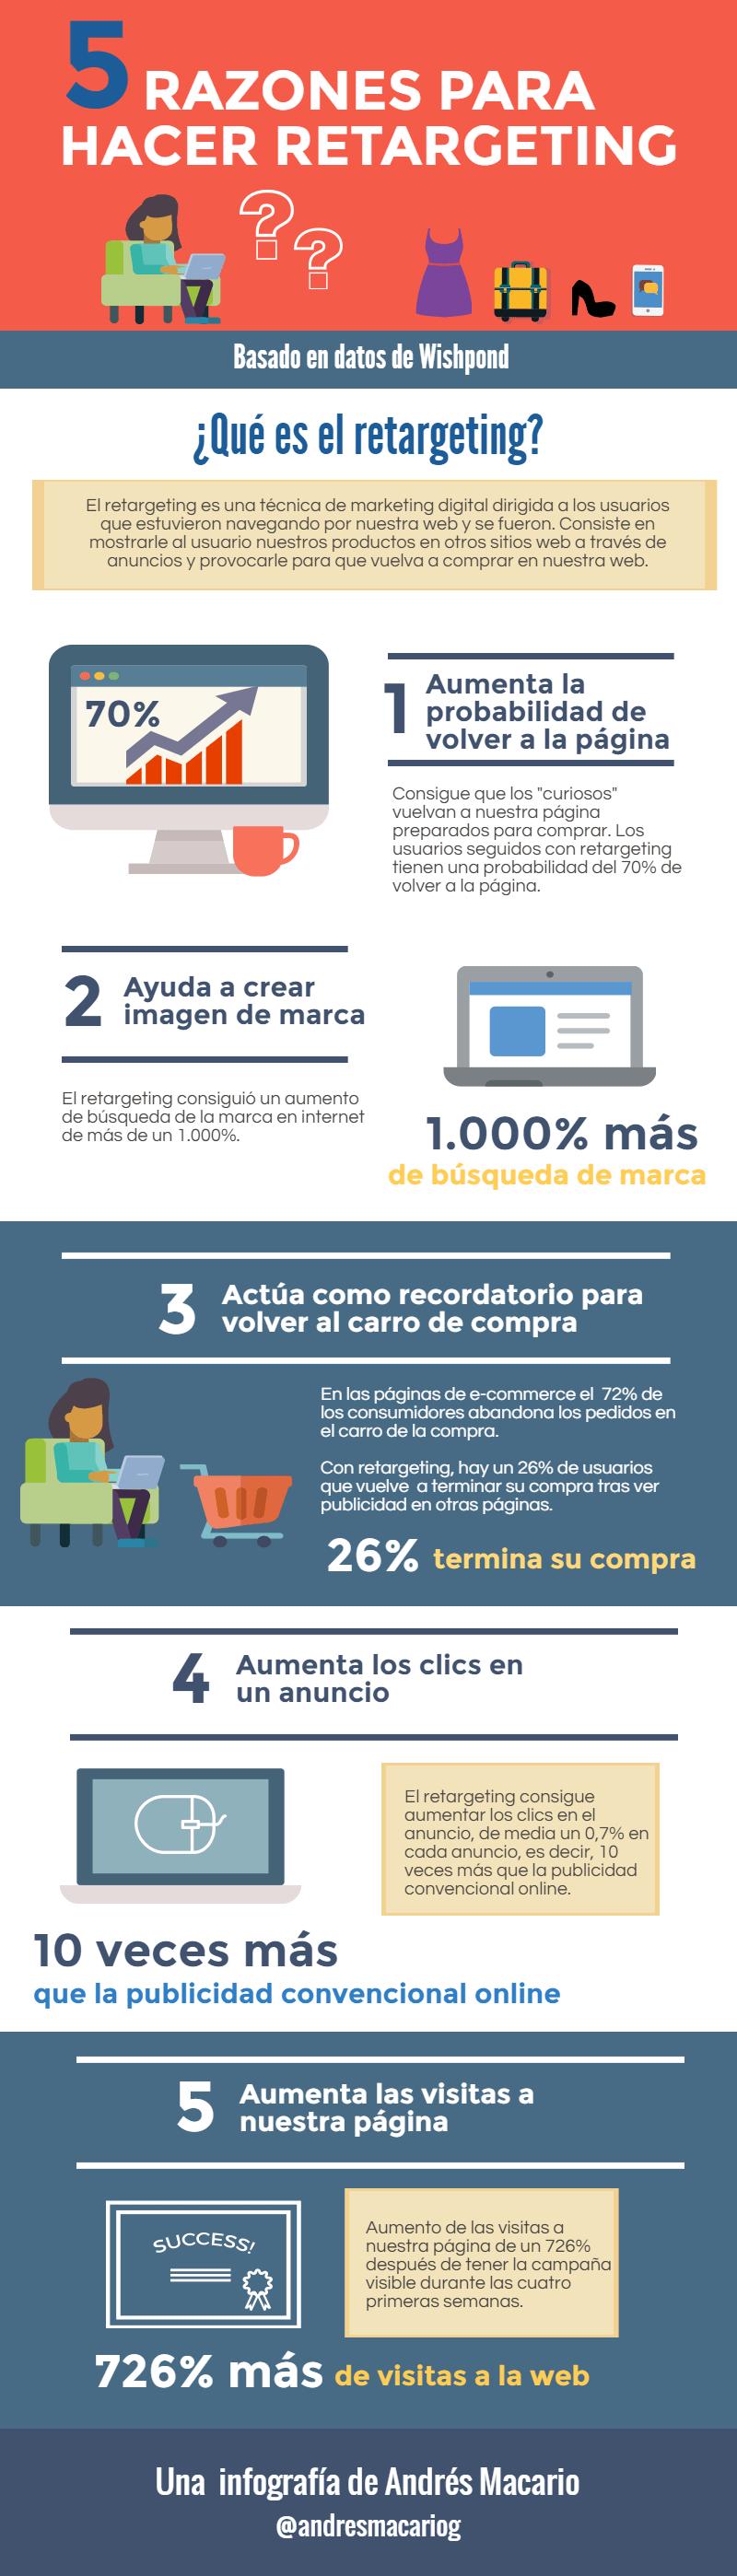 5 razones para hacer retargeting - Infografia Andres Macario